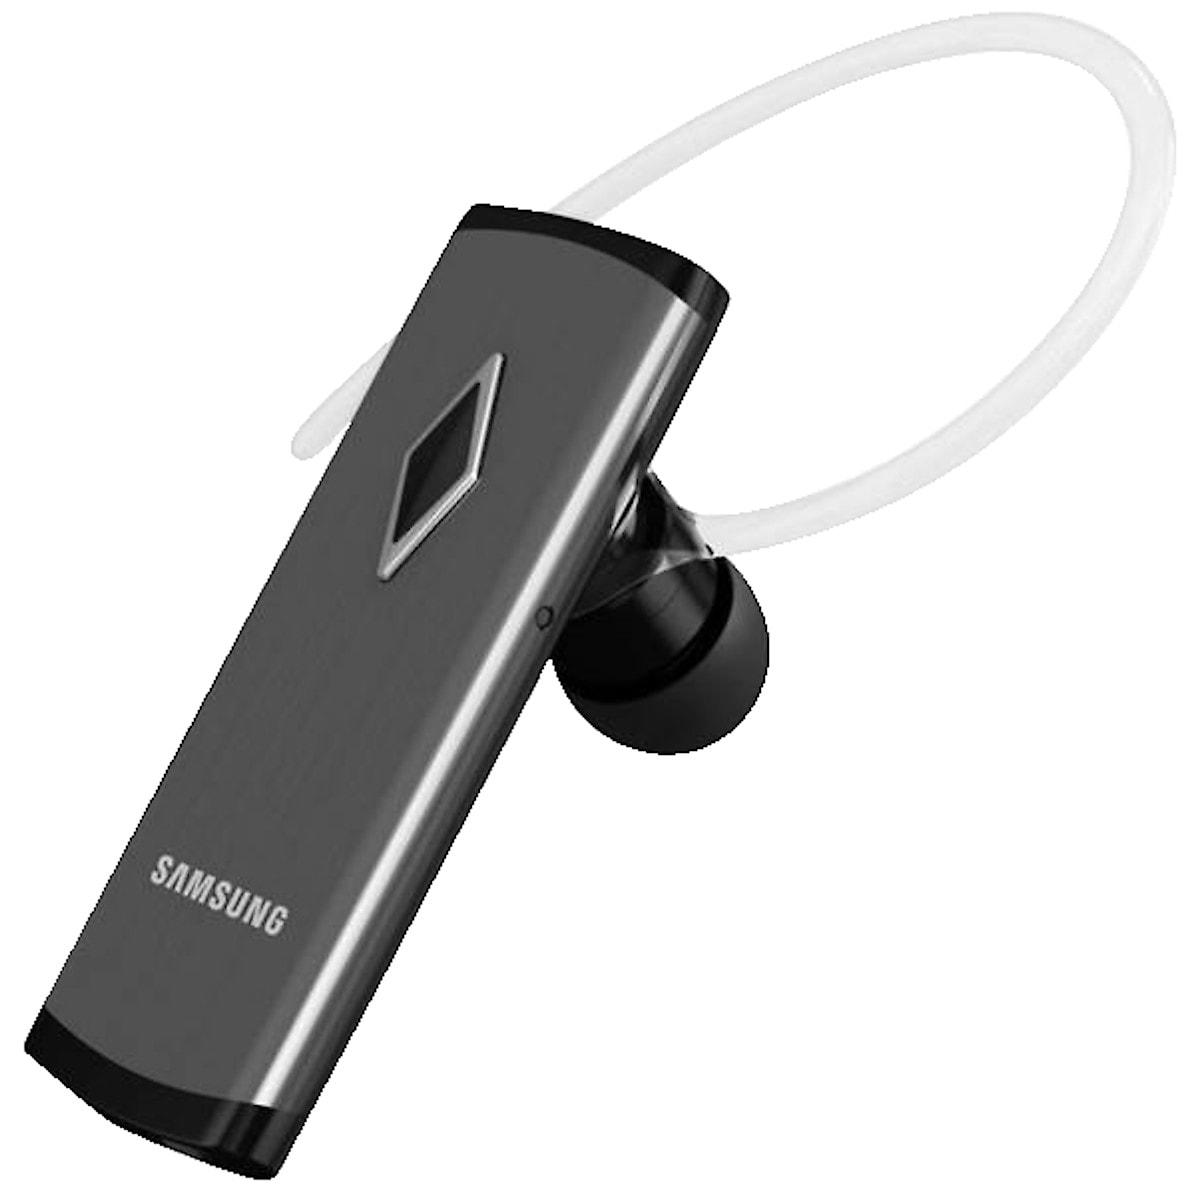 Samsung HM-3200 trådløst headset